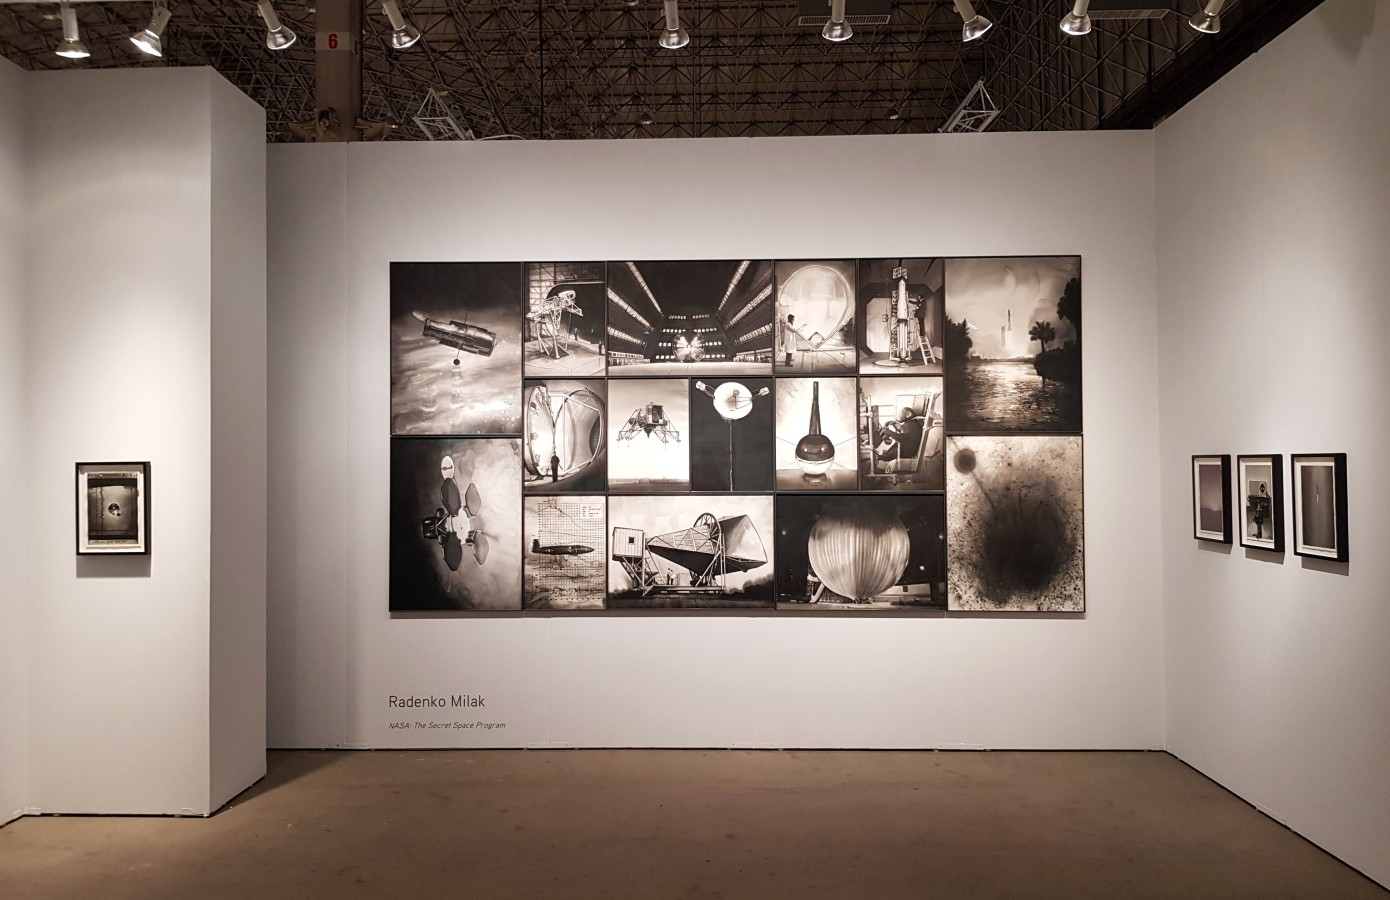 Expo CHICAGO Art Fair, Radenko Milak,